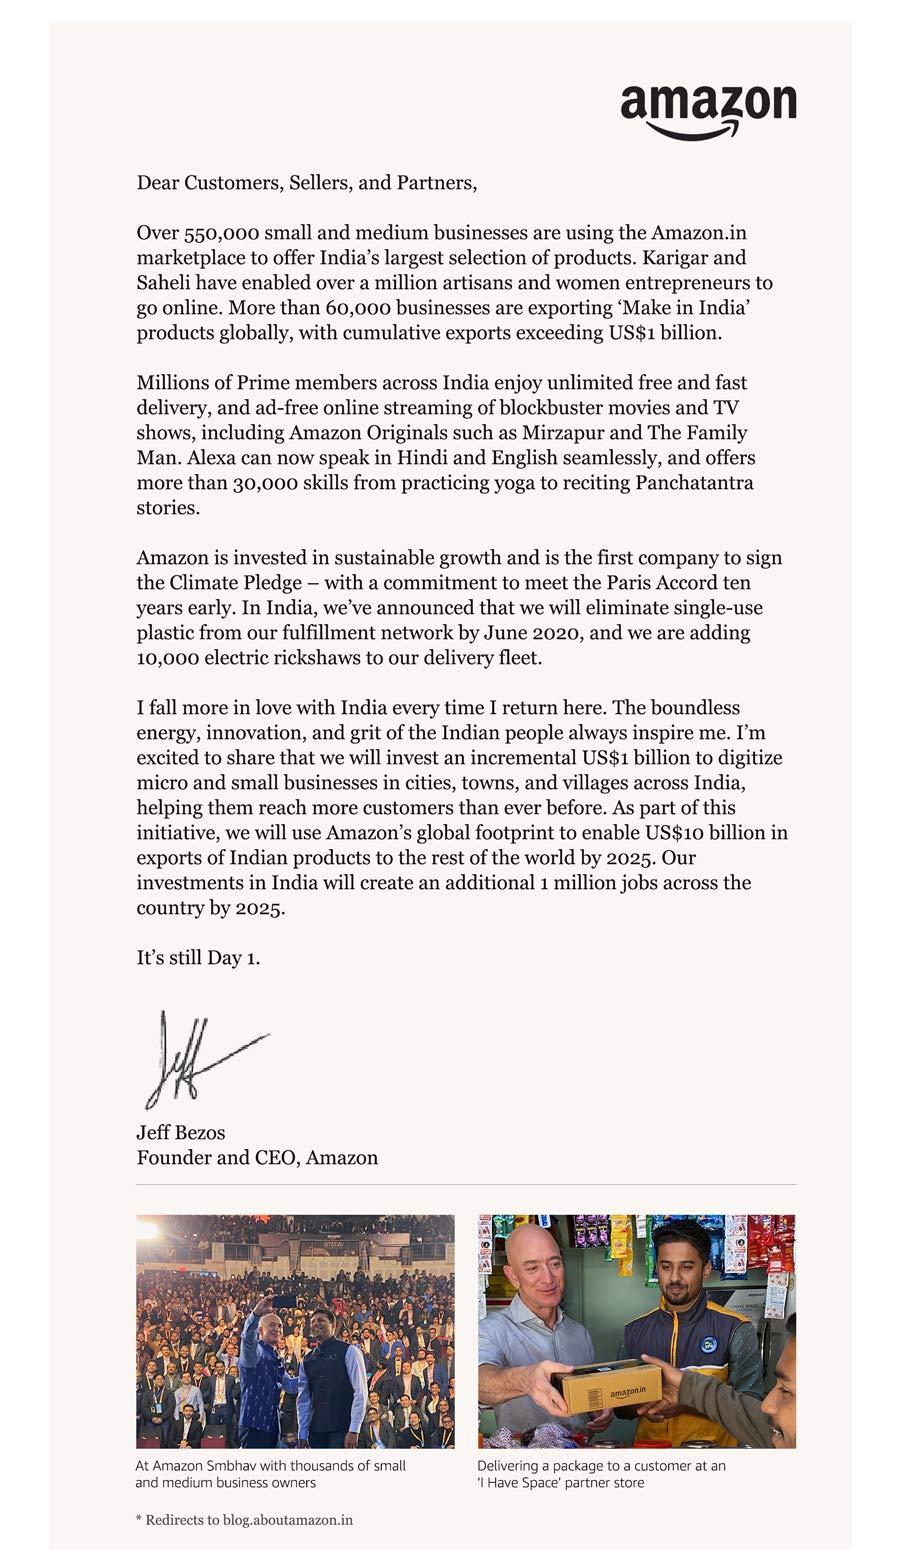 Jeff Letter